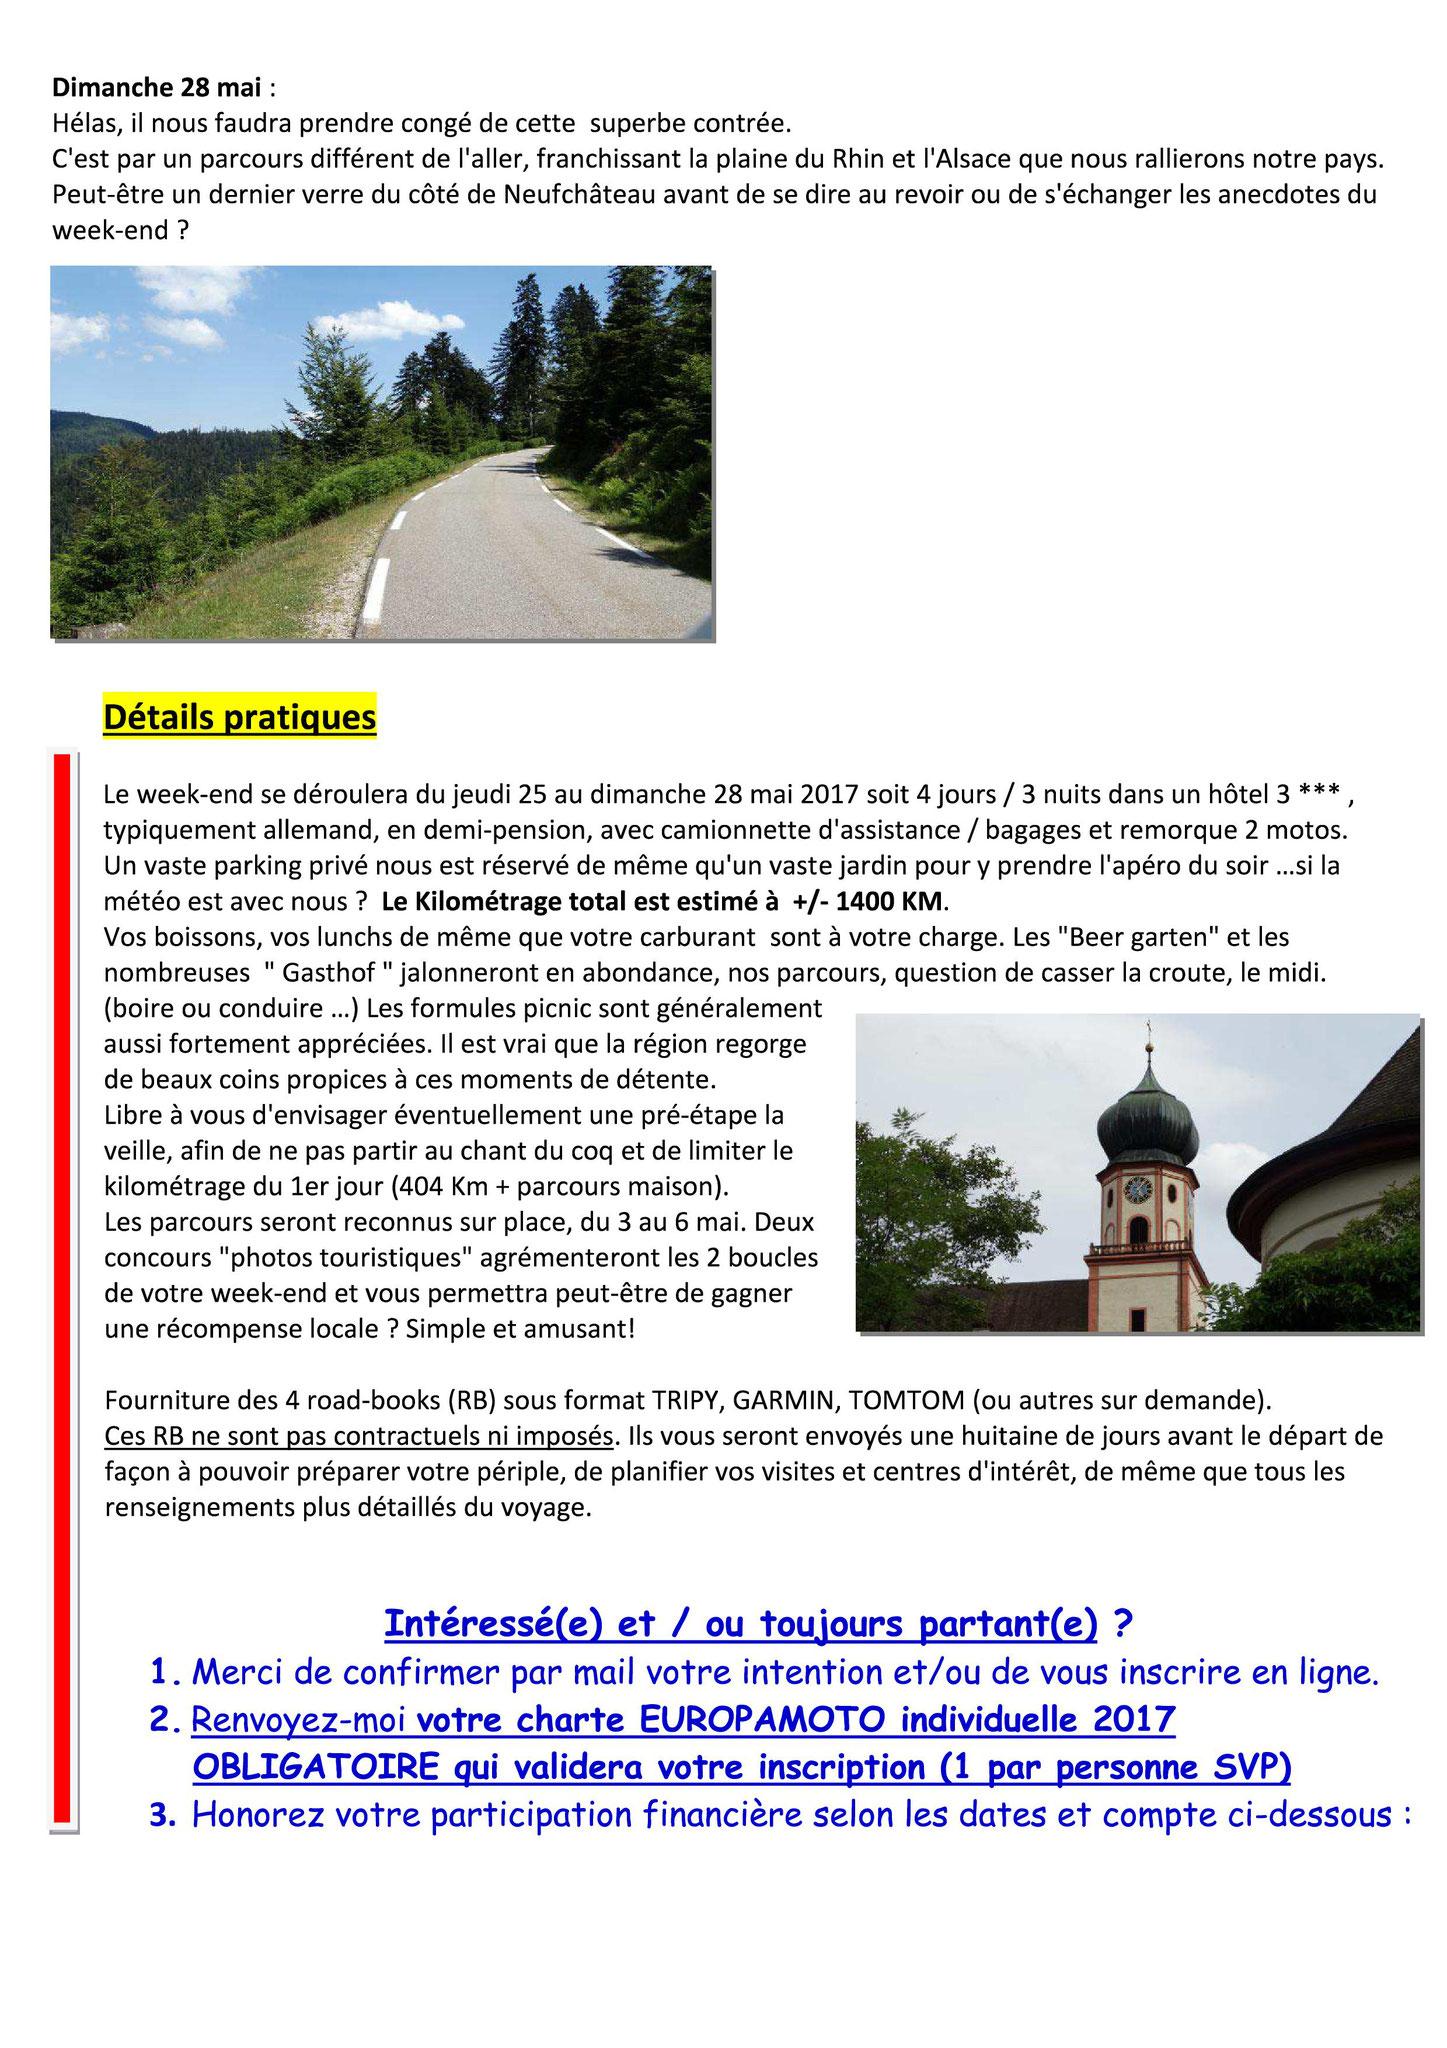 Invitation FORET-NOIRE page 2